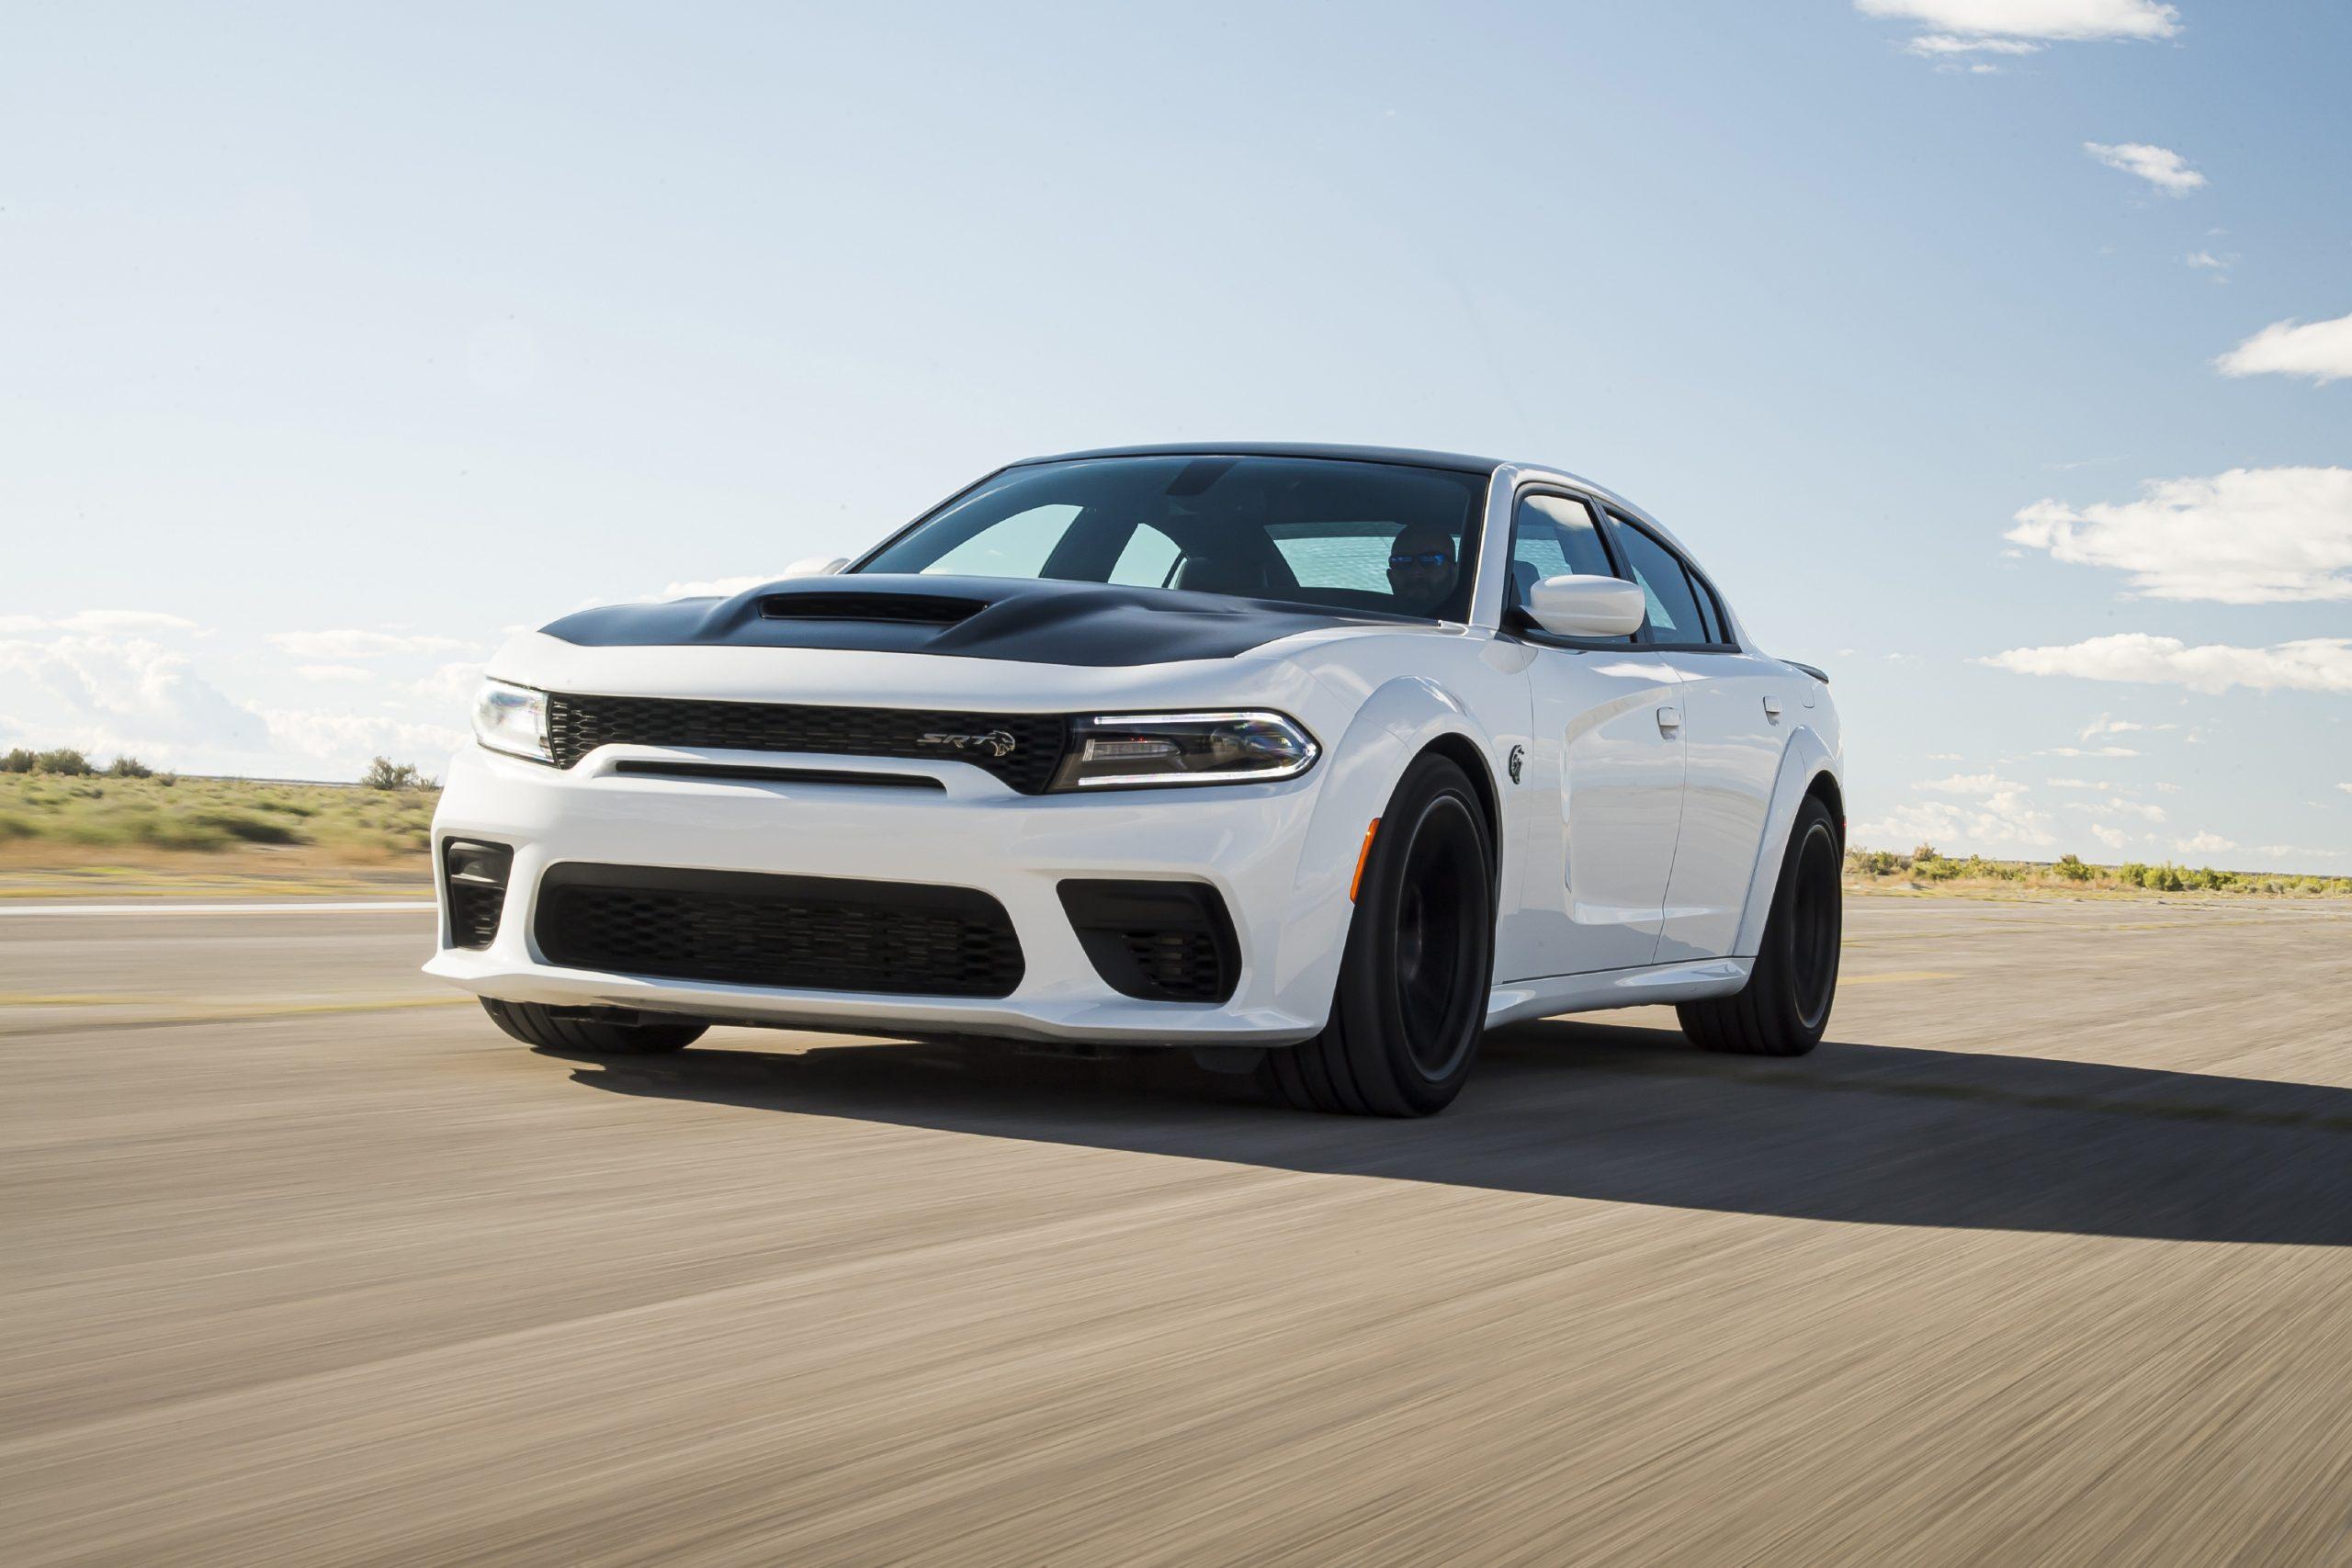 Dodge Introduces 'Demon-possessed' 2021 Dodge Charger SRT Hellcat Redeye